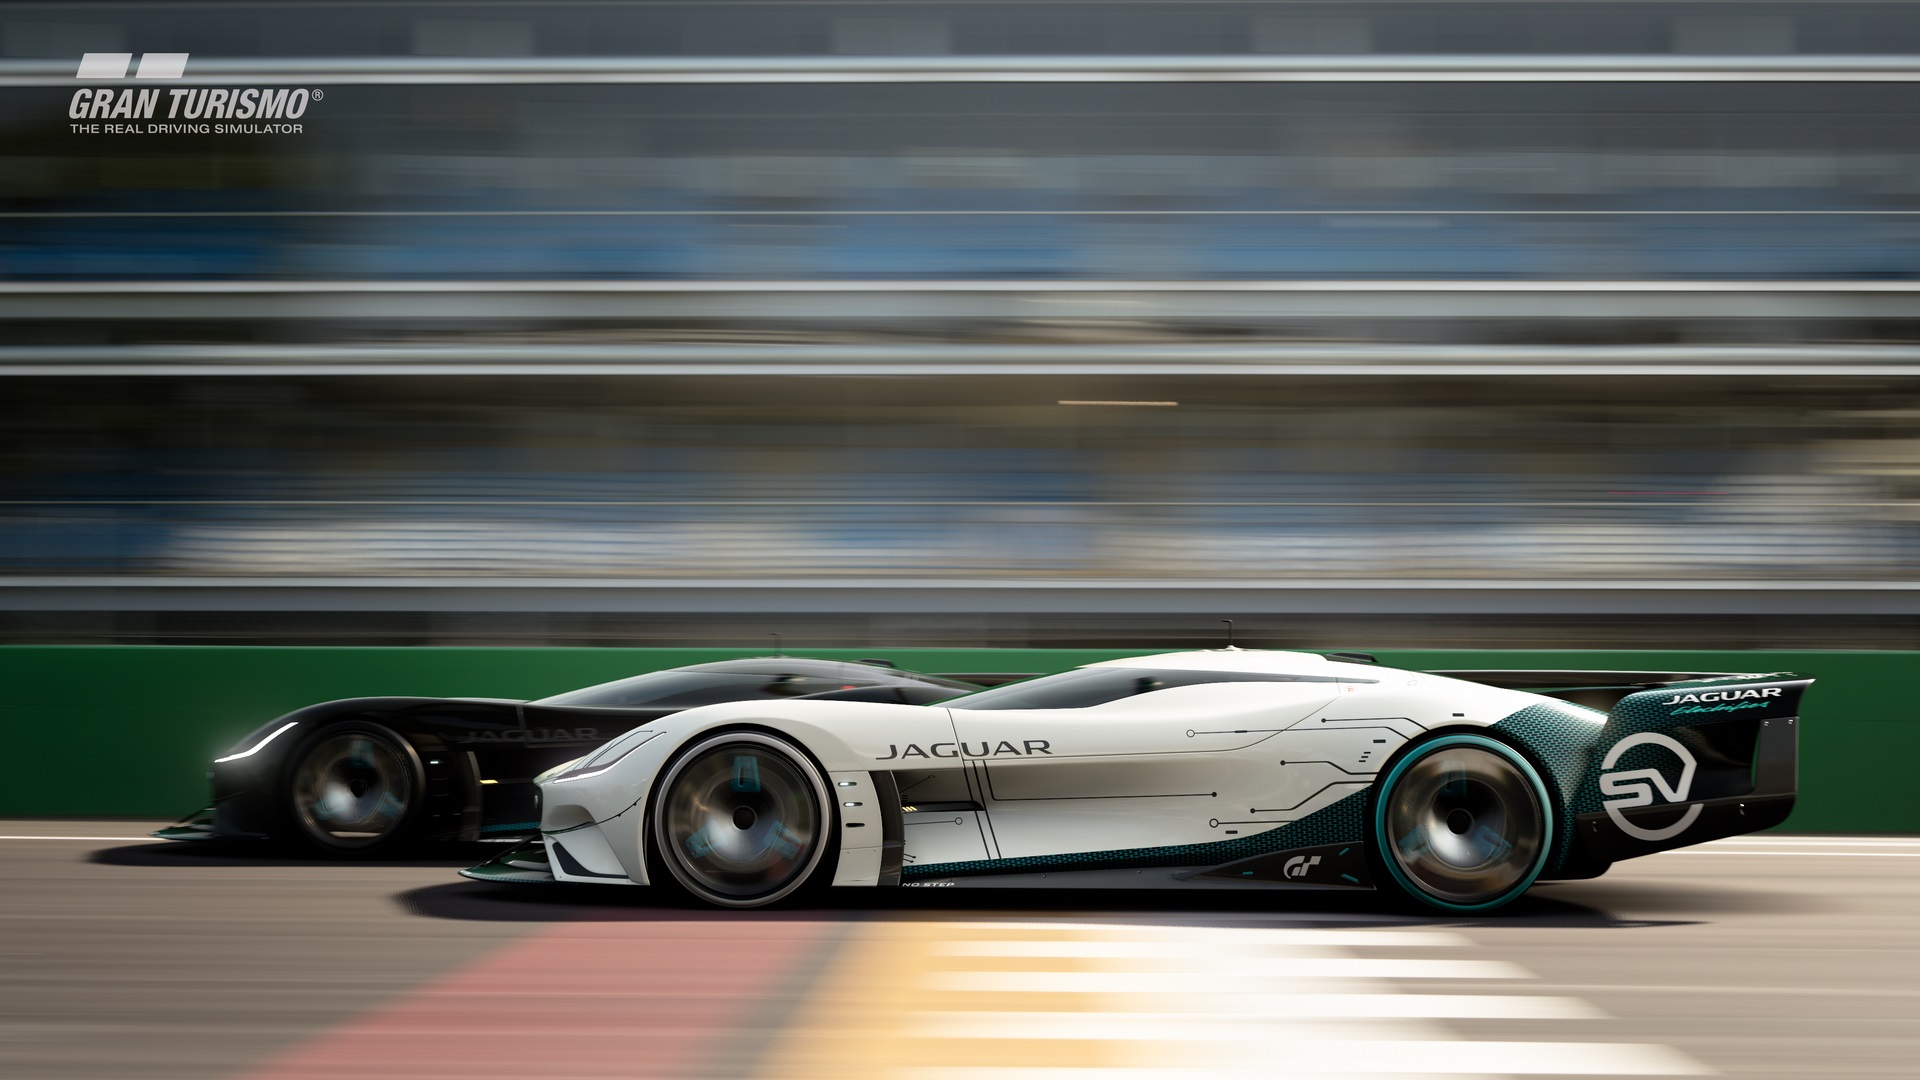 Jaguar-Vision-Gran-Turismo-SV-10